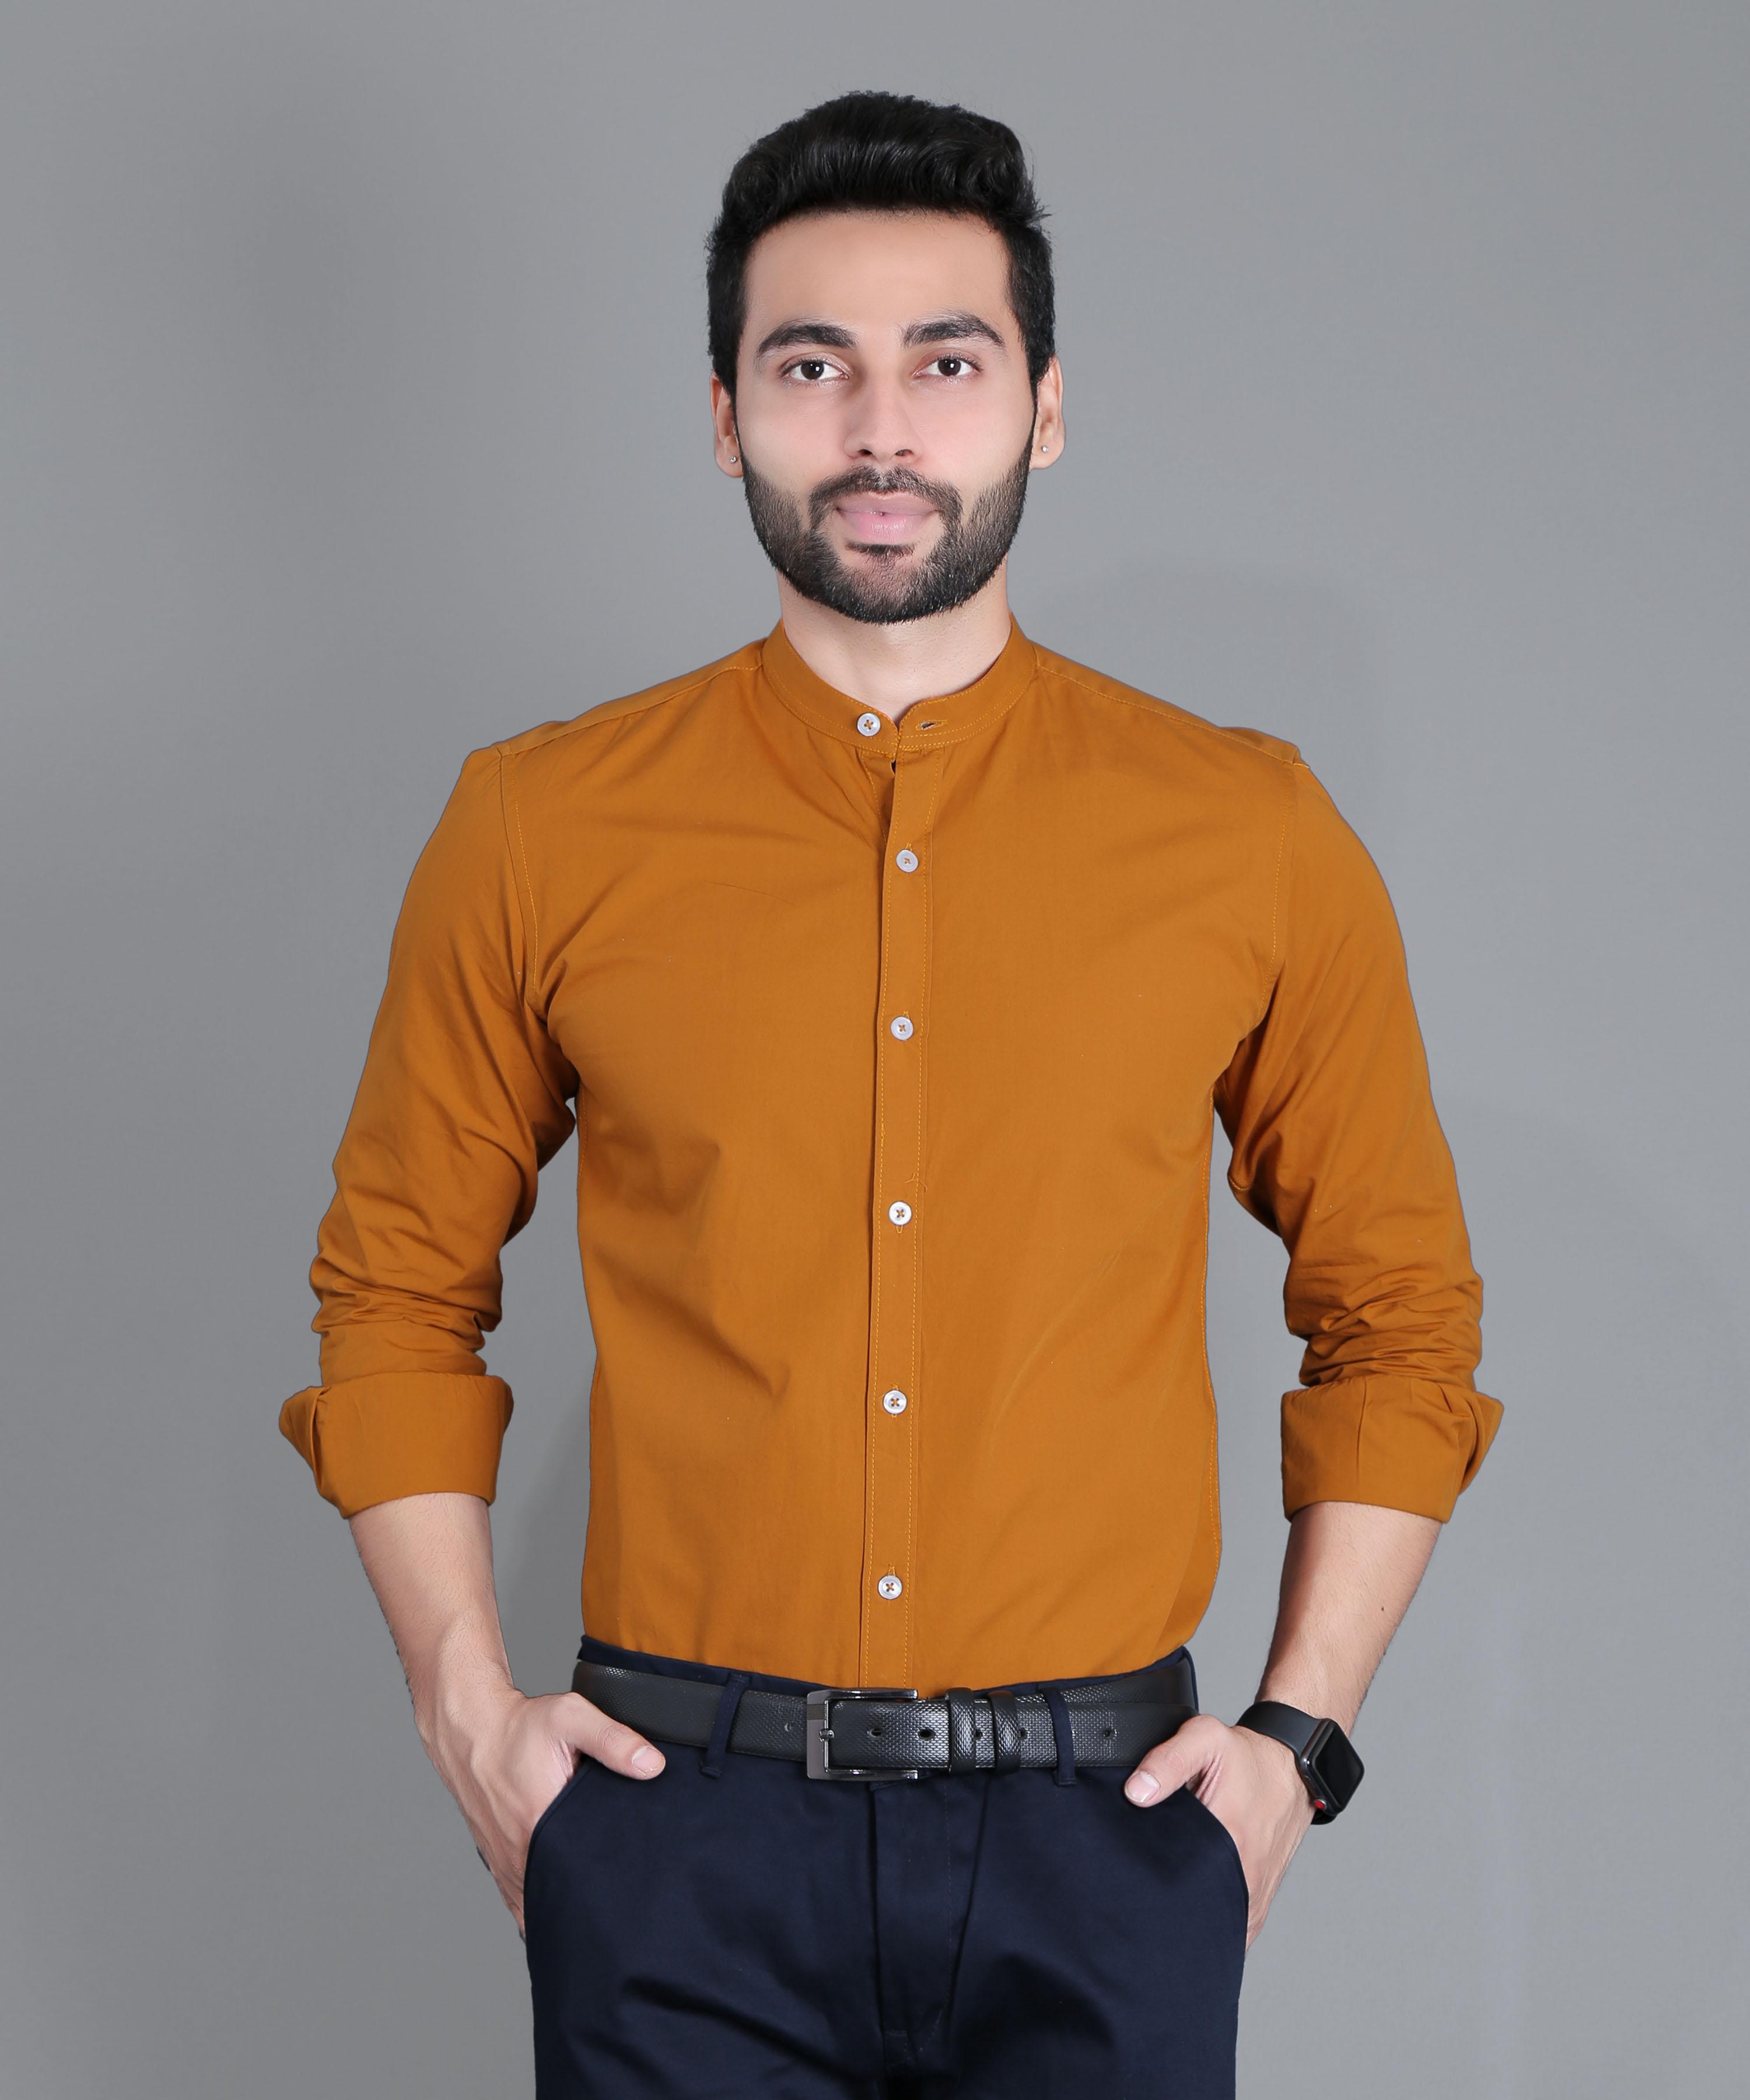 FIFTH ANFOLD Formal Mandrin Collar full Sleev/Long Sleev Copper Brown Pure Cotton Plain Solid Men Shirt